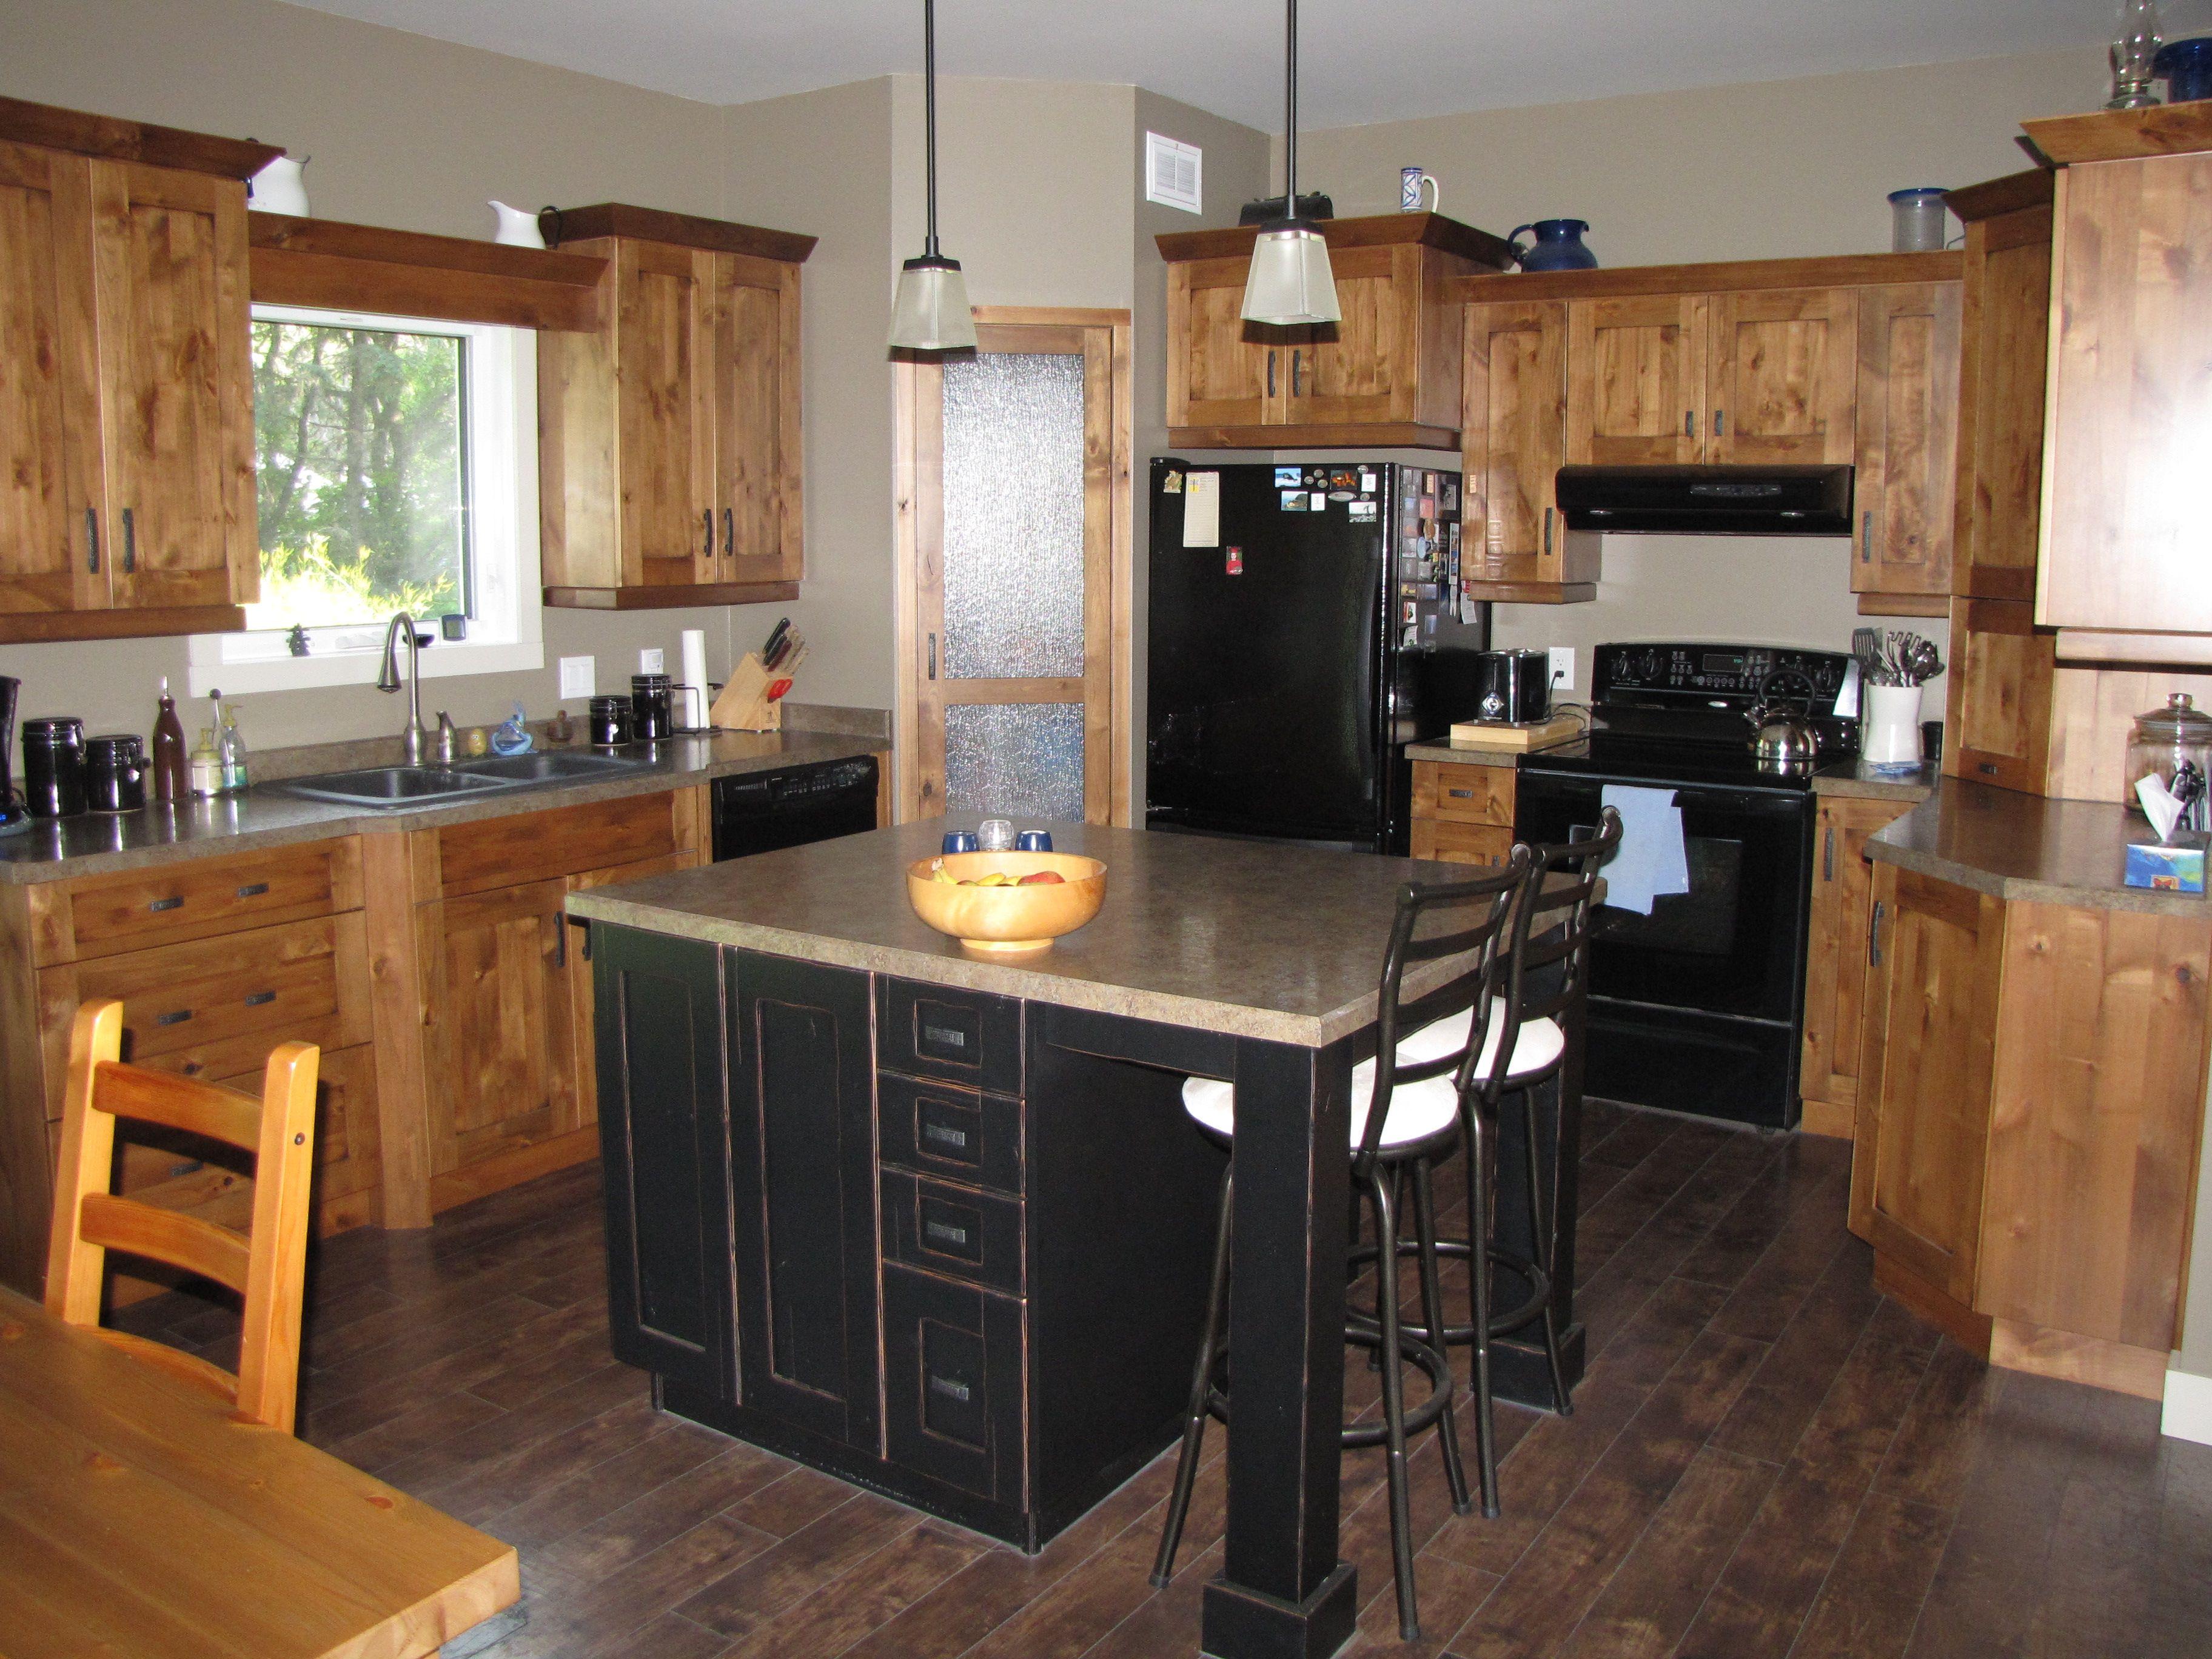 Kitchen Cabinets Knotty Alder Natural with Black Glaze Island